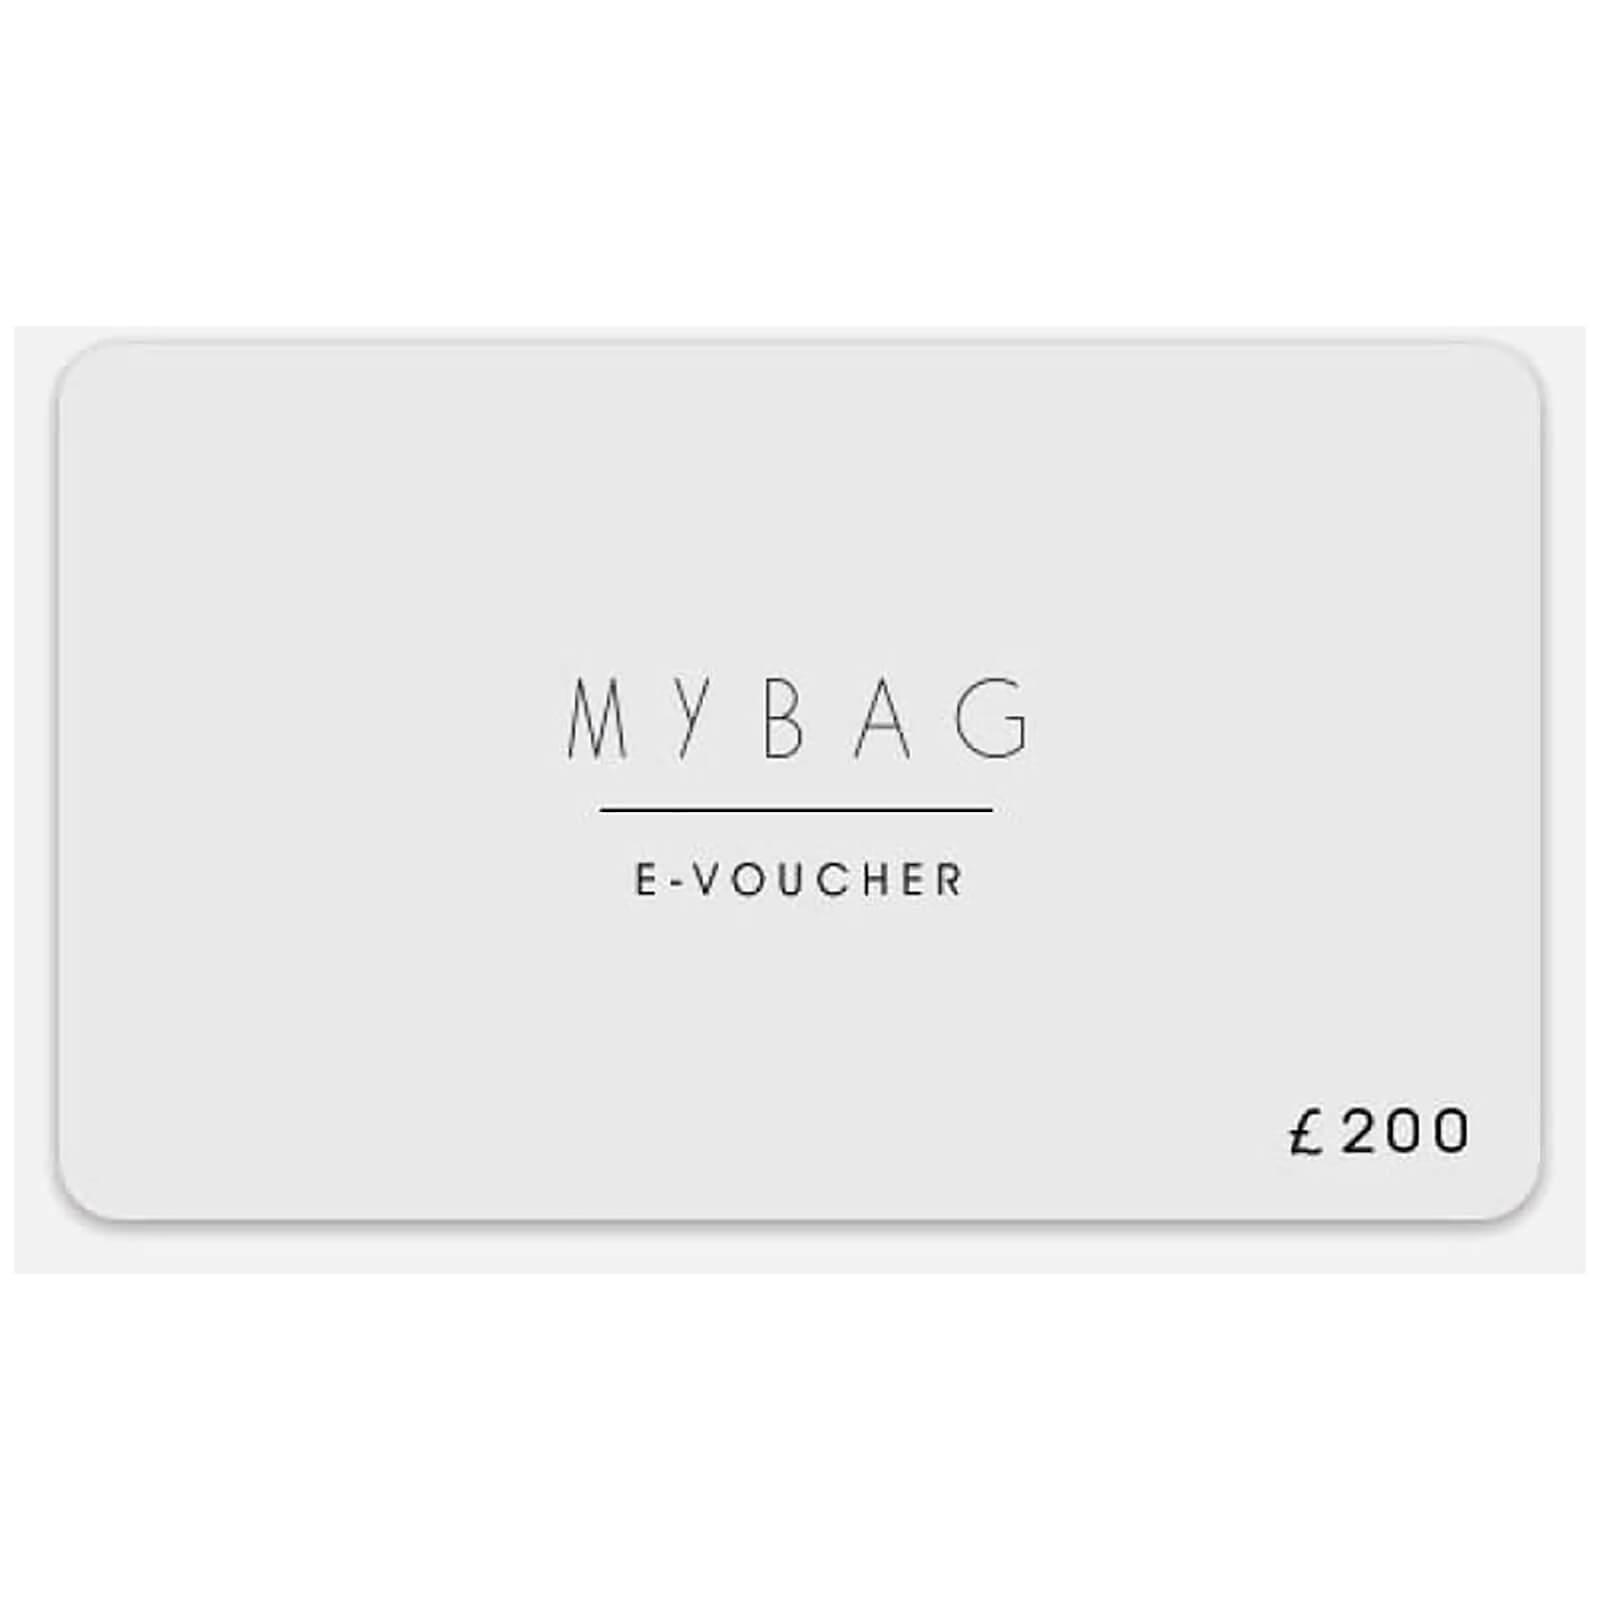 £200 MyBag Gift Voucher